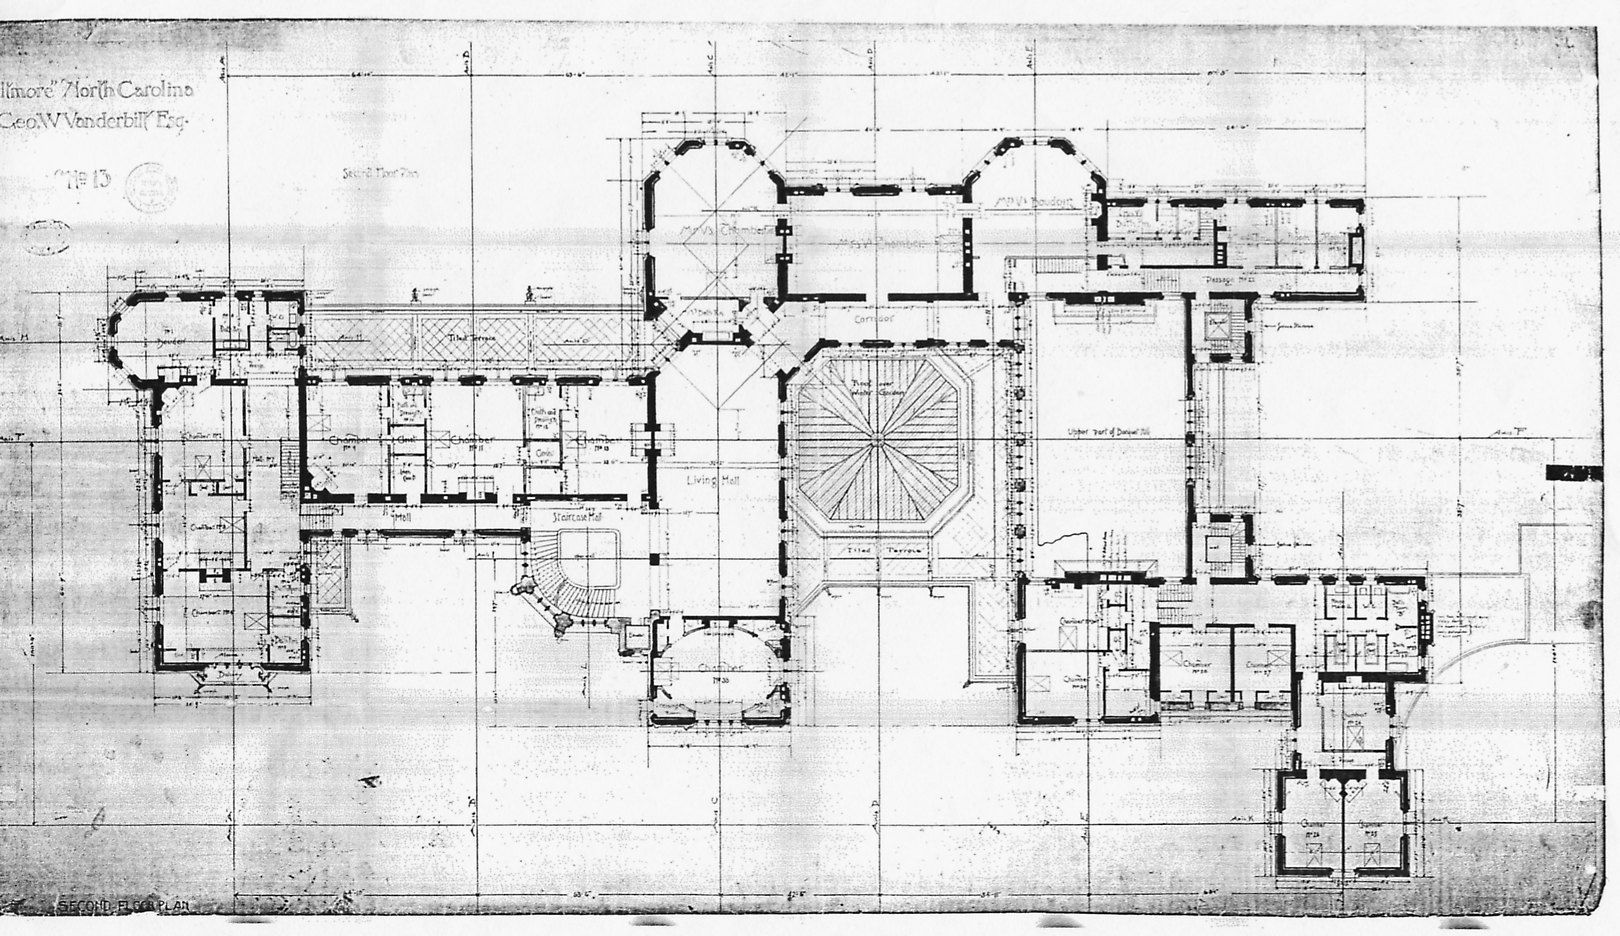 biltmore house floor plan – Biltmore House Floor Plan